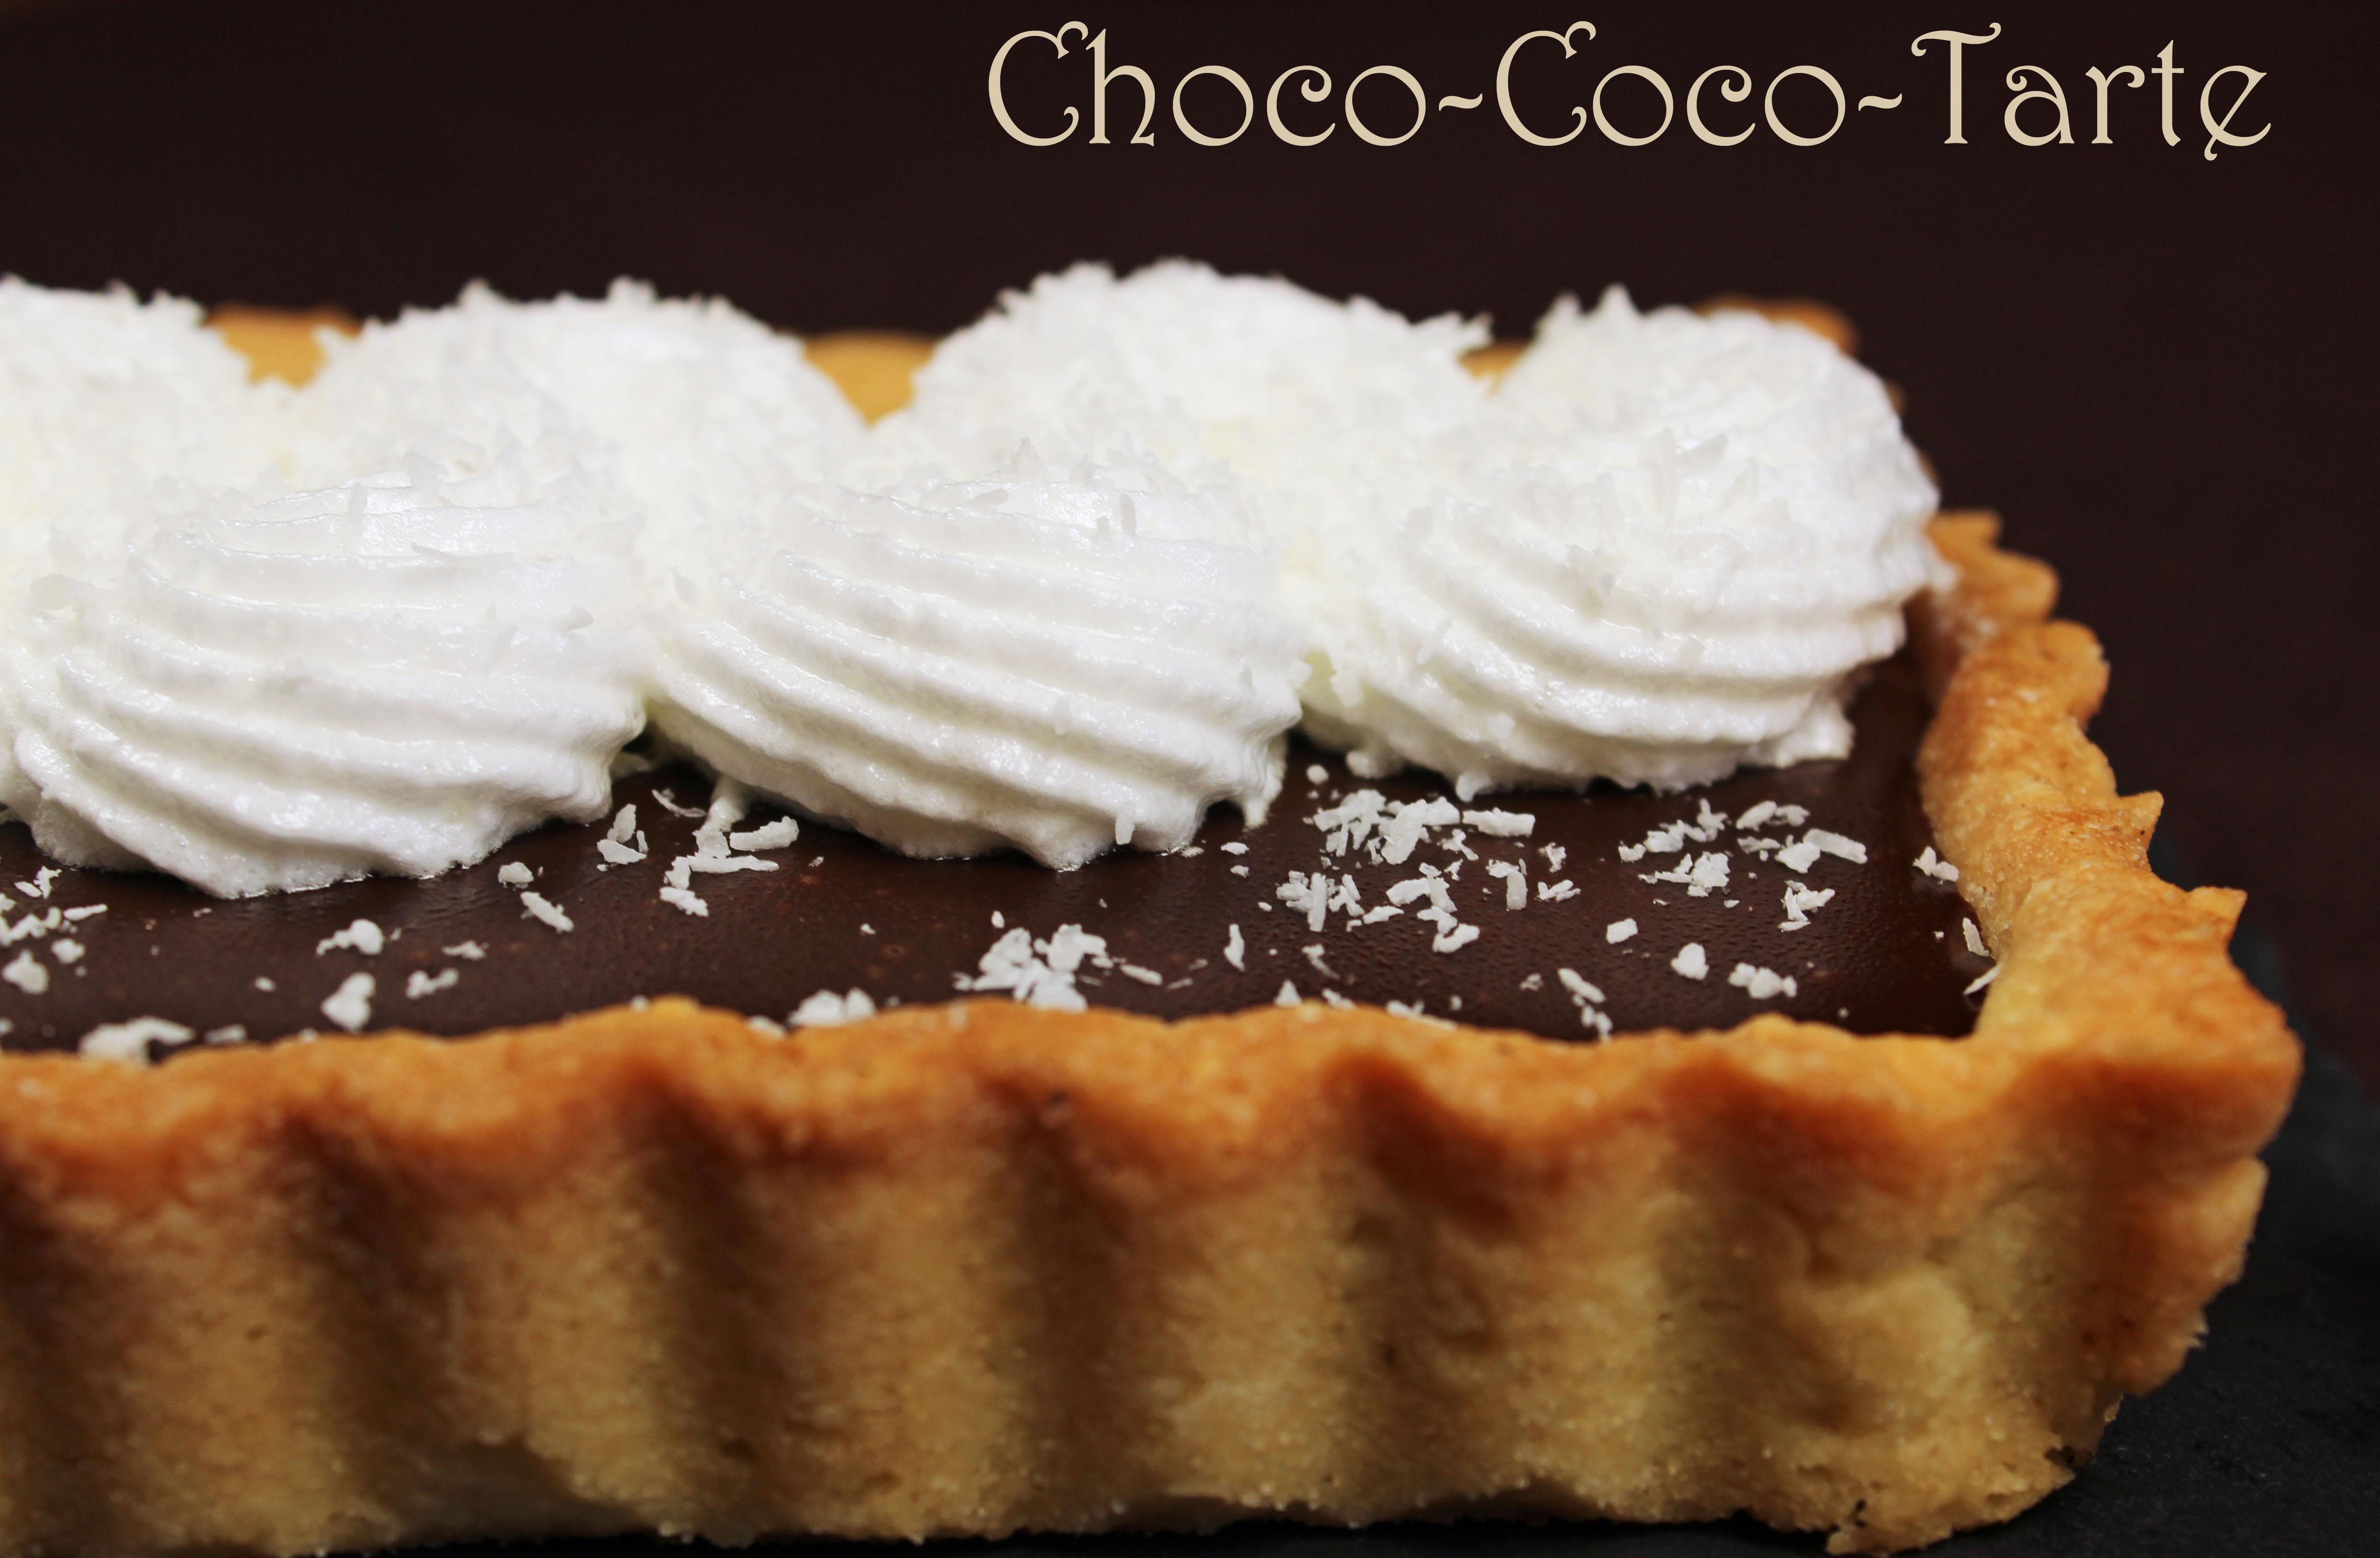 Chocococo Tarte_3894_2-1